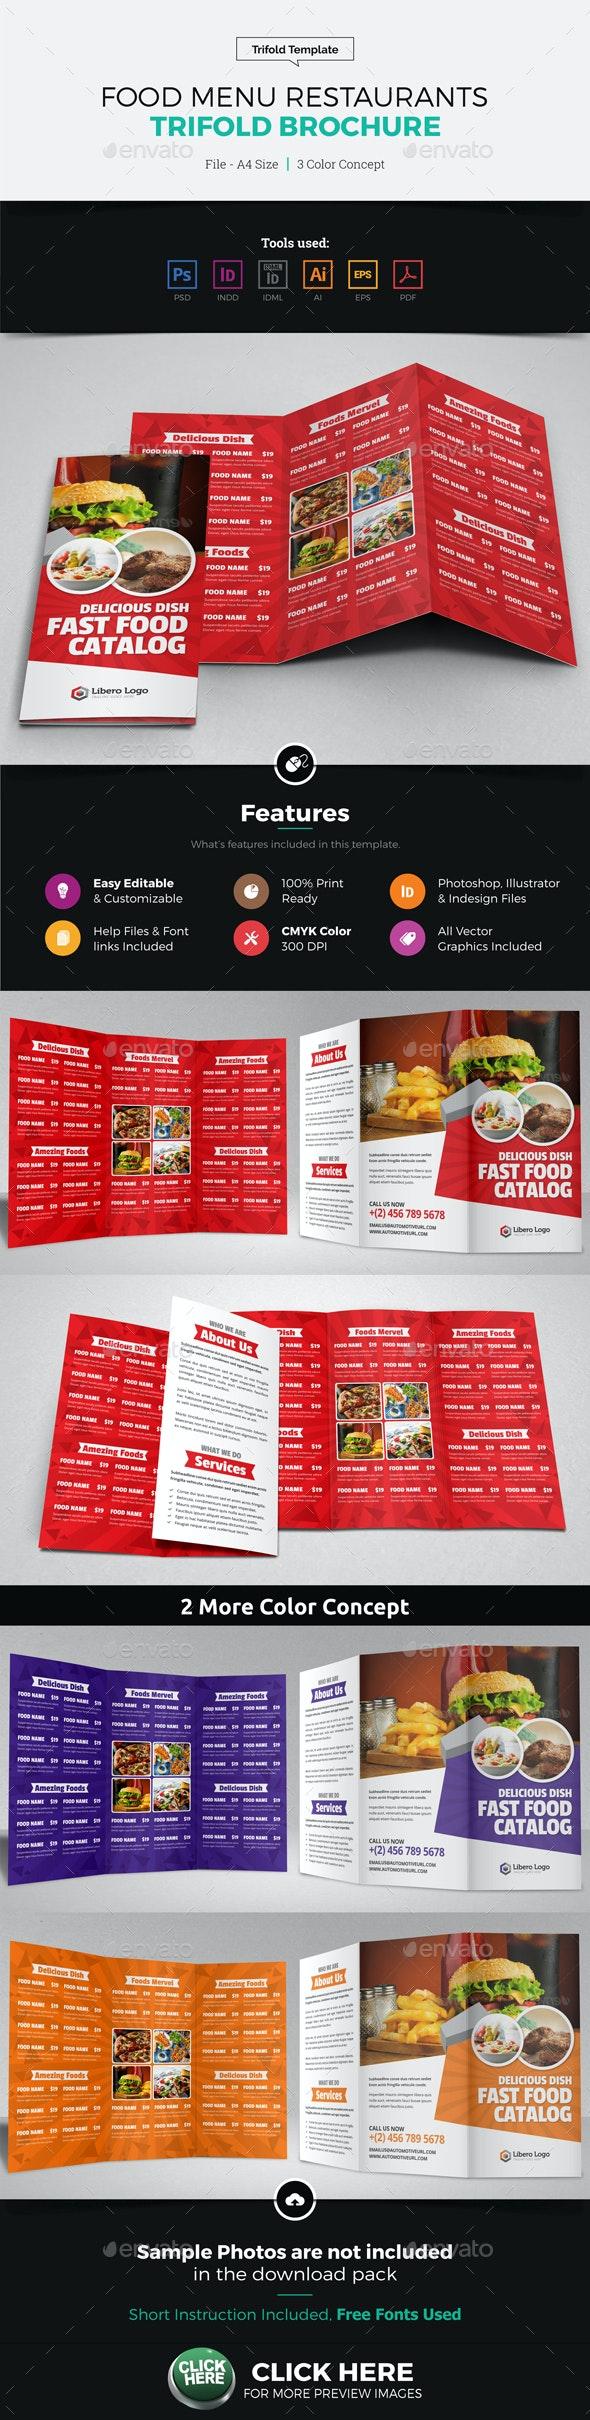 Food Menu Restaurants Trifold Brochure - Catalogs Brochures